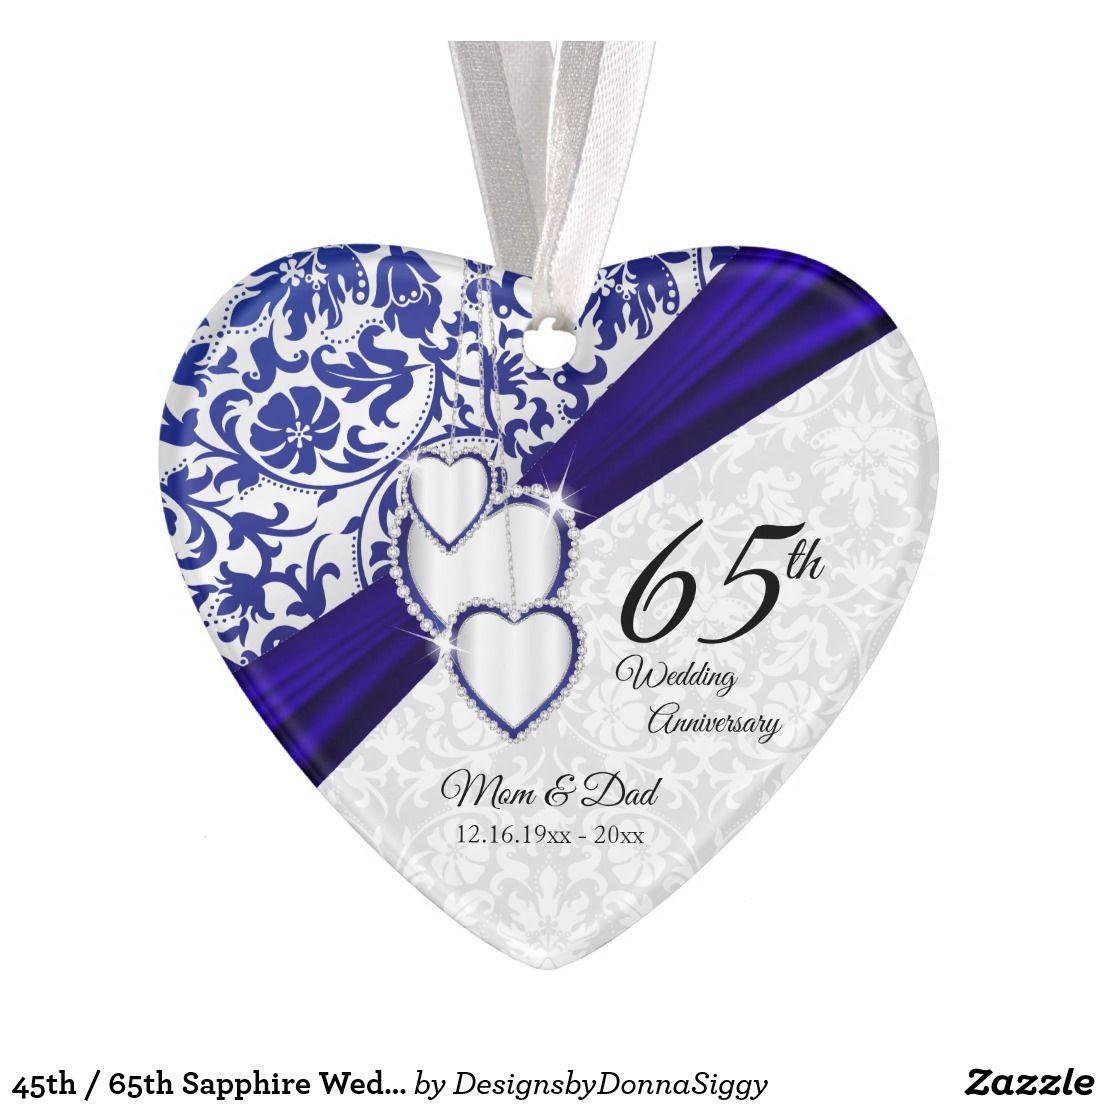 45th / 65th Sapphire Wedding Anniversary Keepsake Ornament